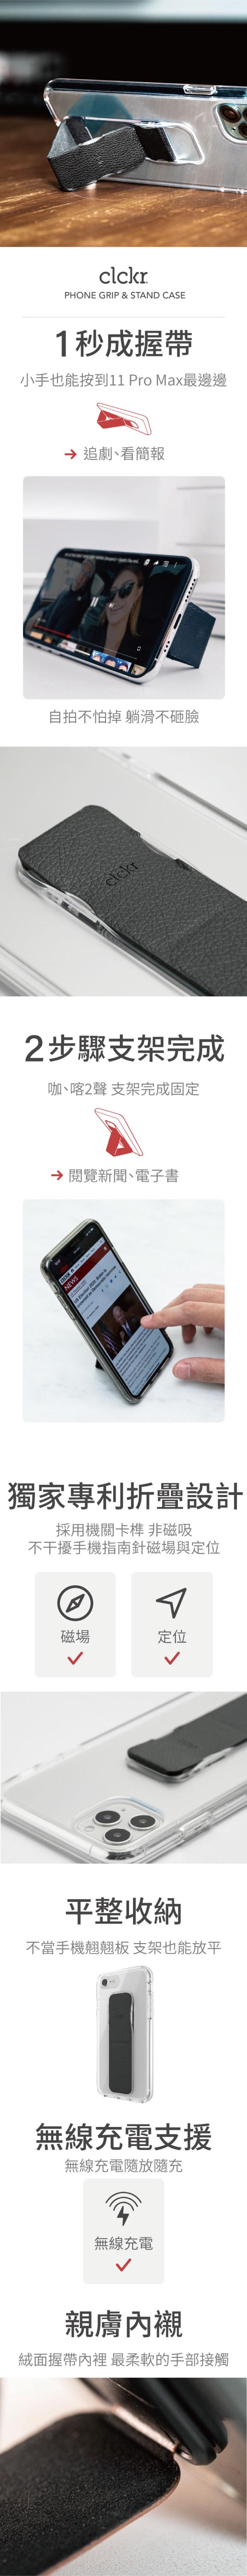 CLCKR|iPhone 6/6s/7/8/SE2 手機殼 透明支架 金色款